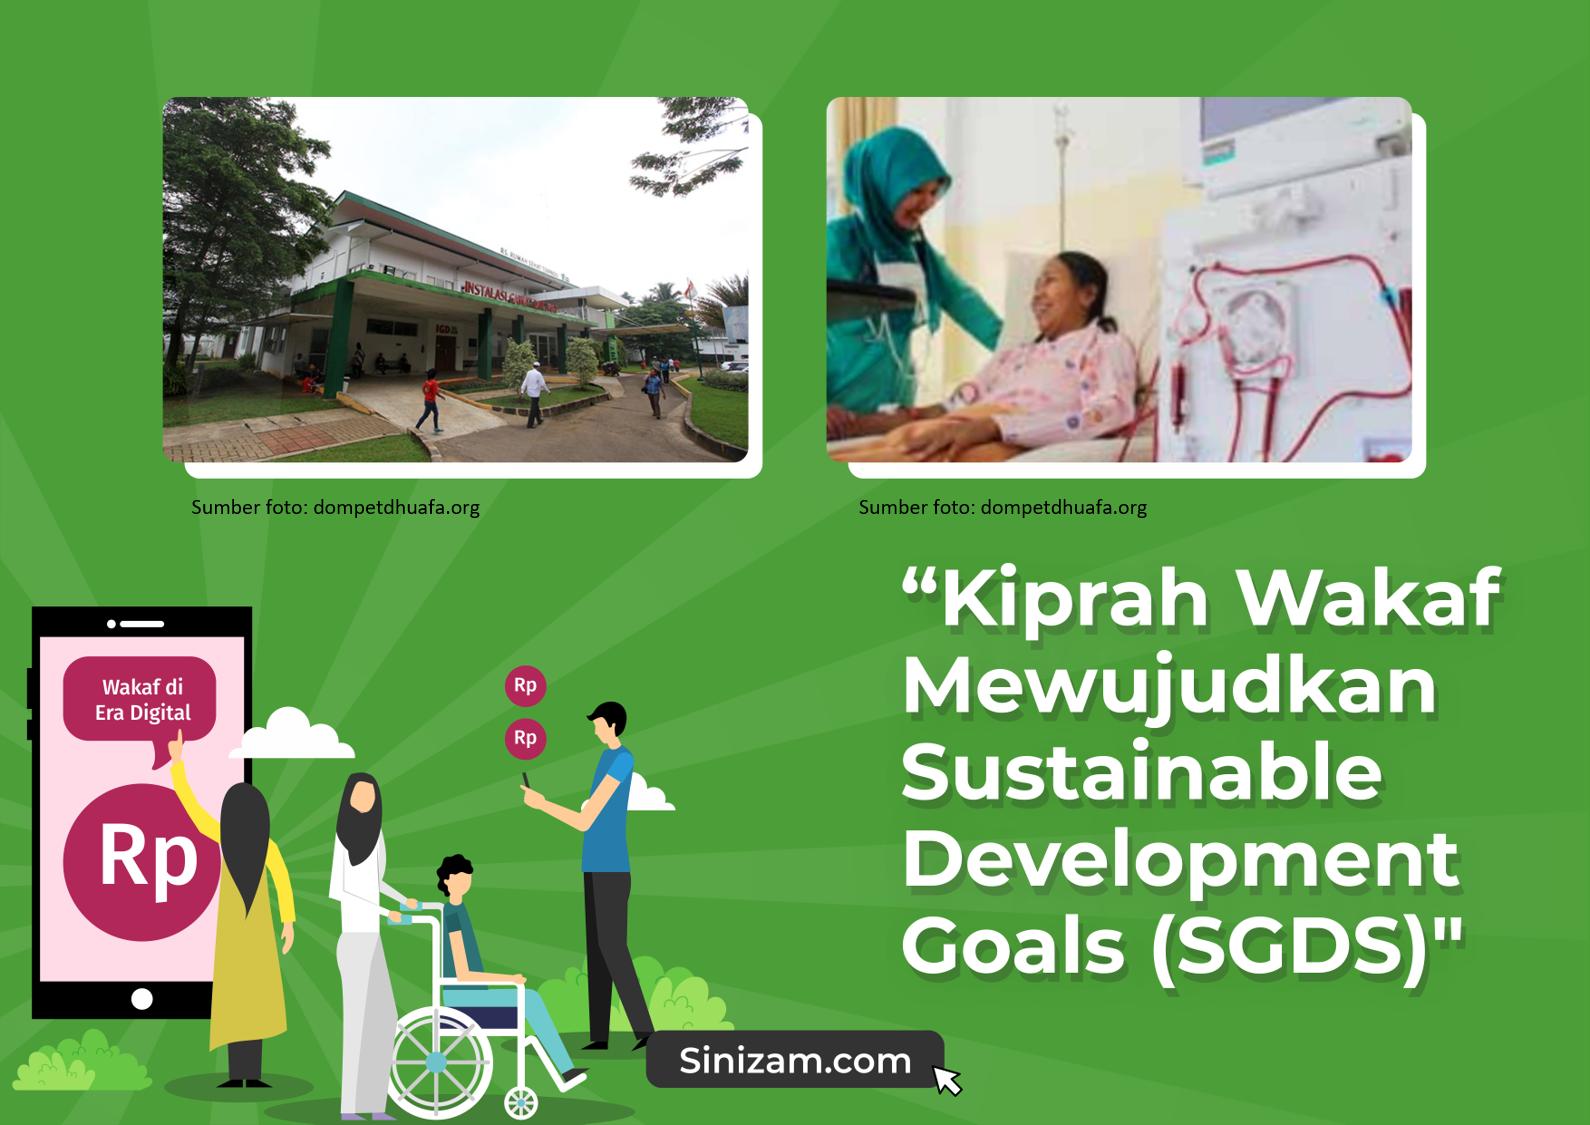 Kiprah Wakaf Mewujudkan Sustainable Development Goals (SDGs)